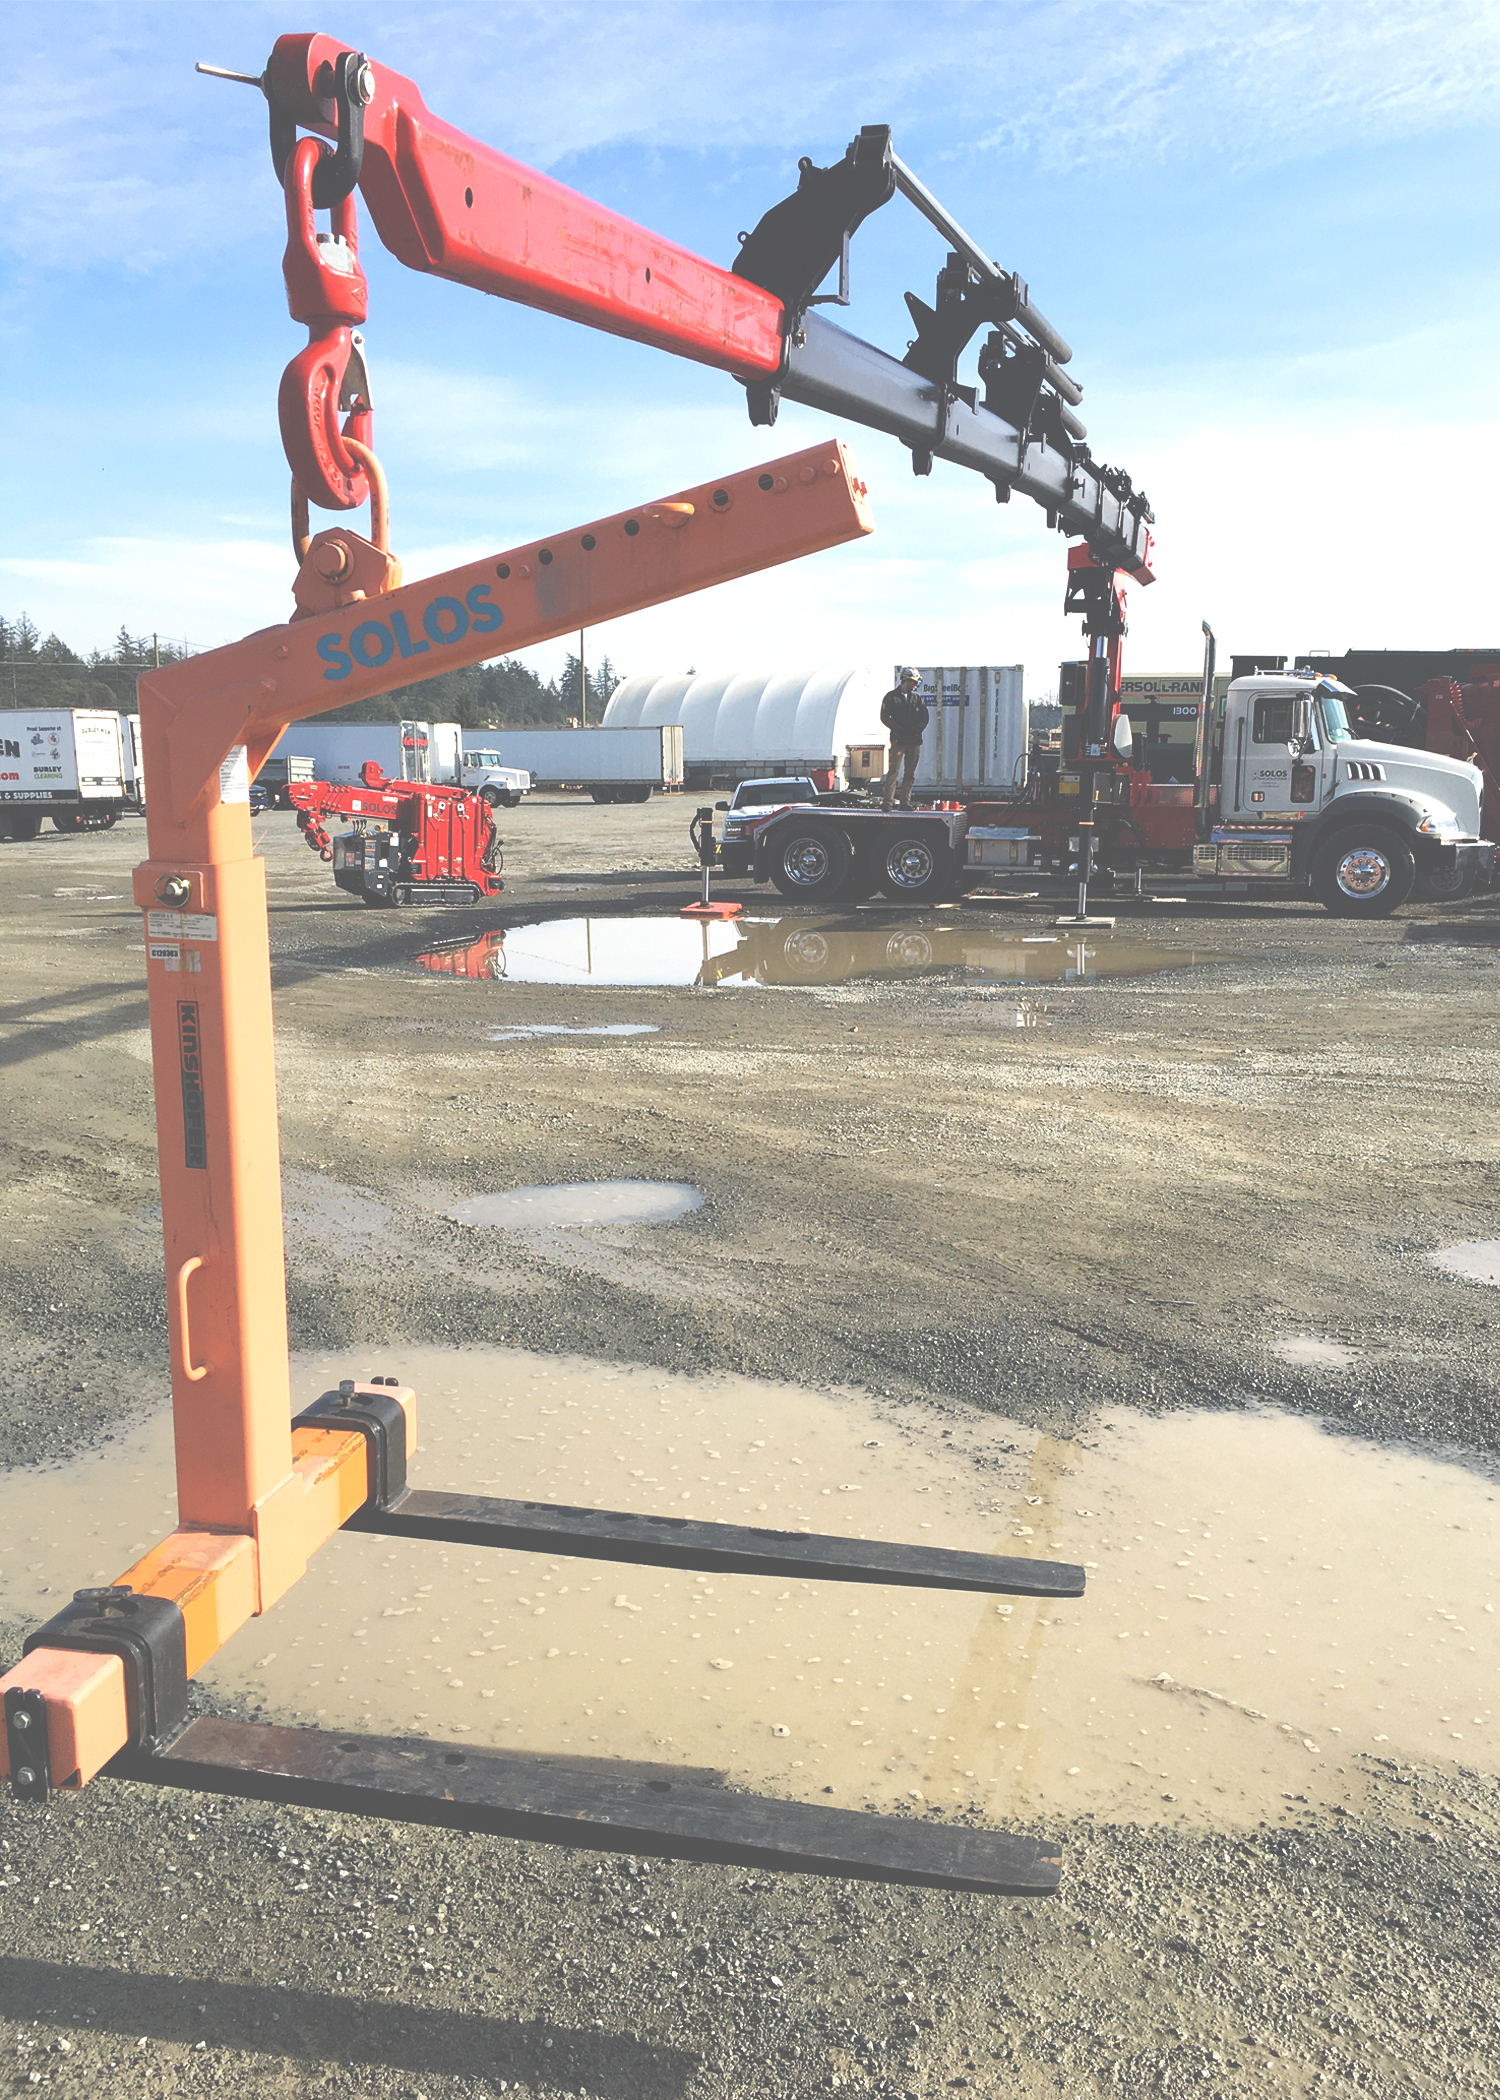 pallet forks, a picker truck, palfinger, crane, lifting, solos